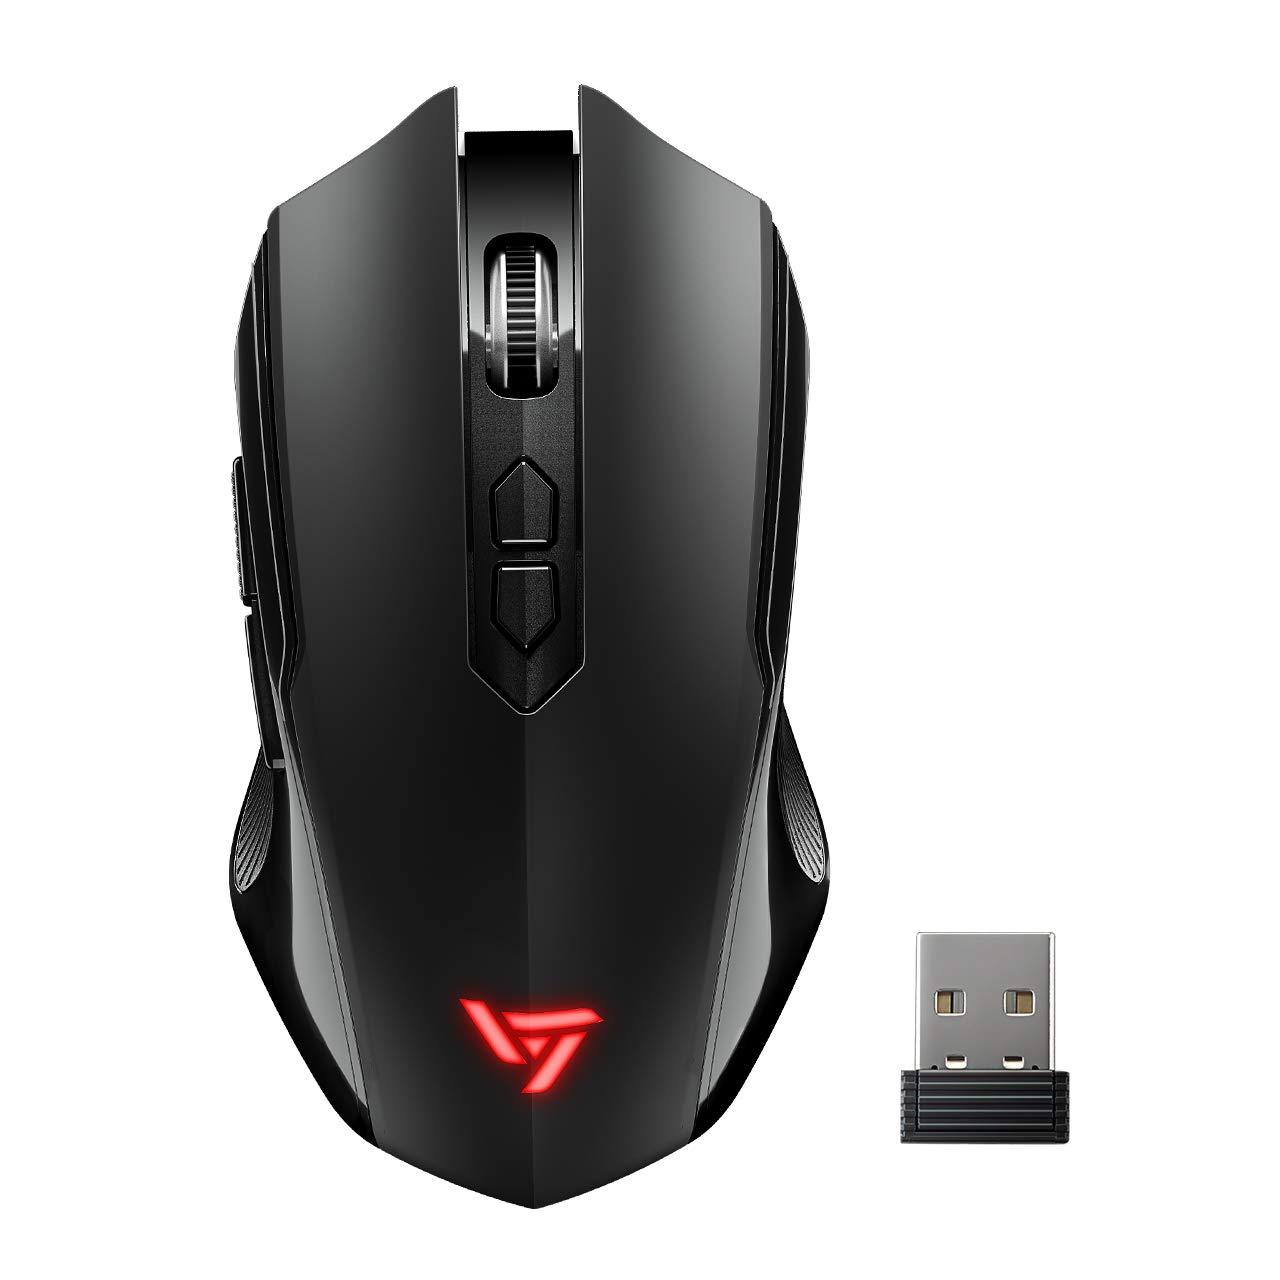 Mouse Gamer : VicTsing Sin Cable Unique Silent Click Portabl